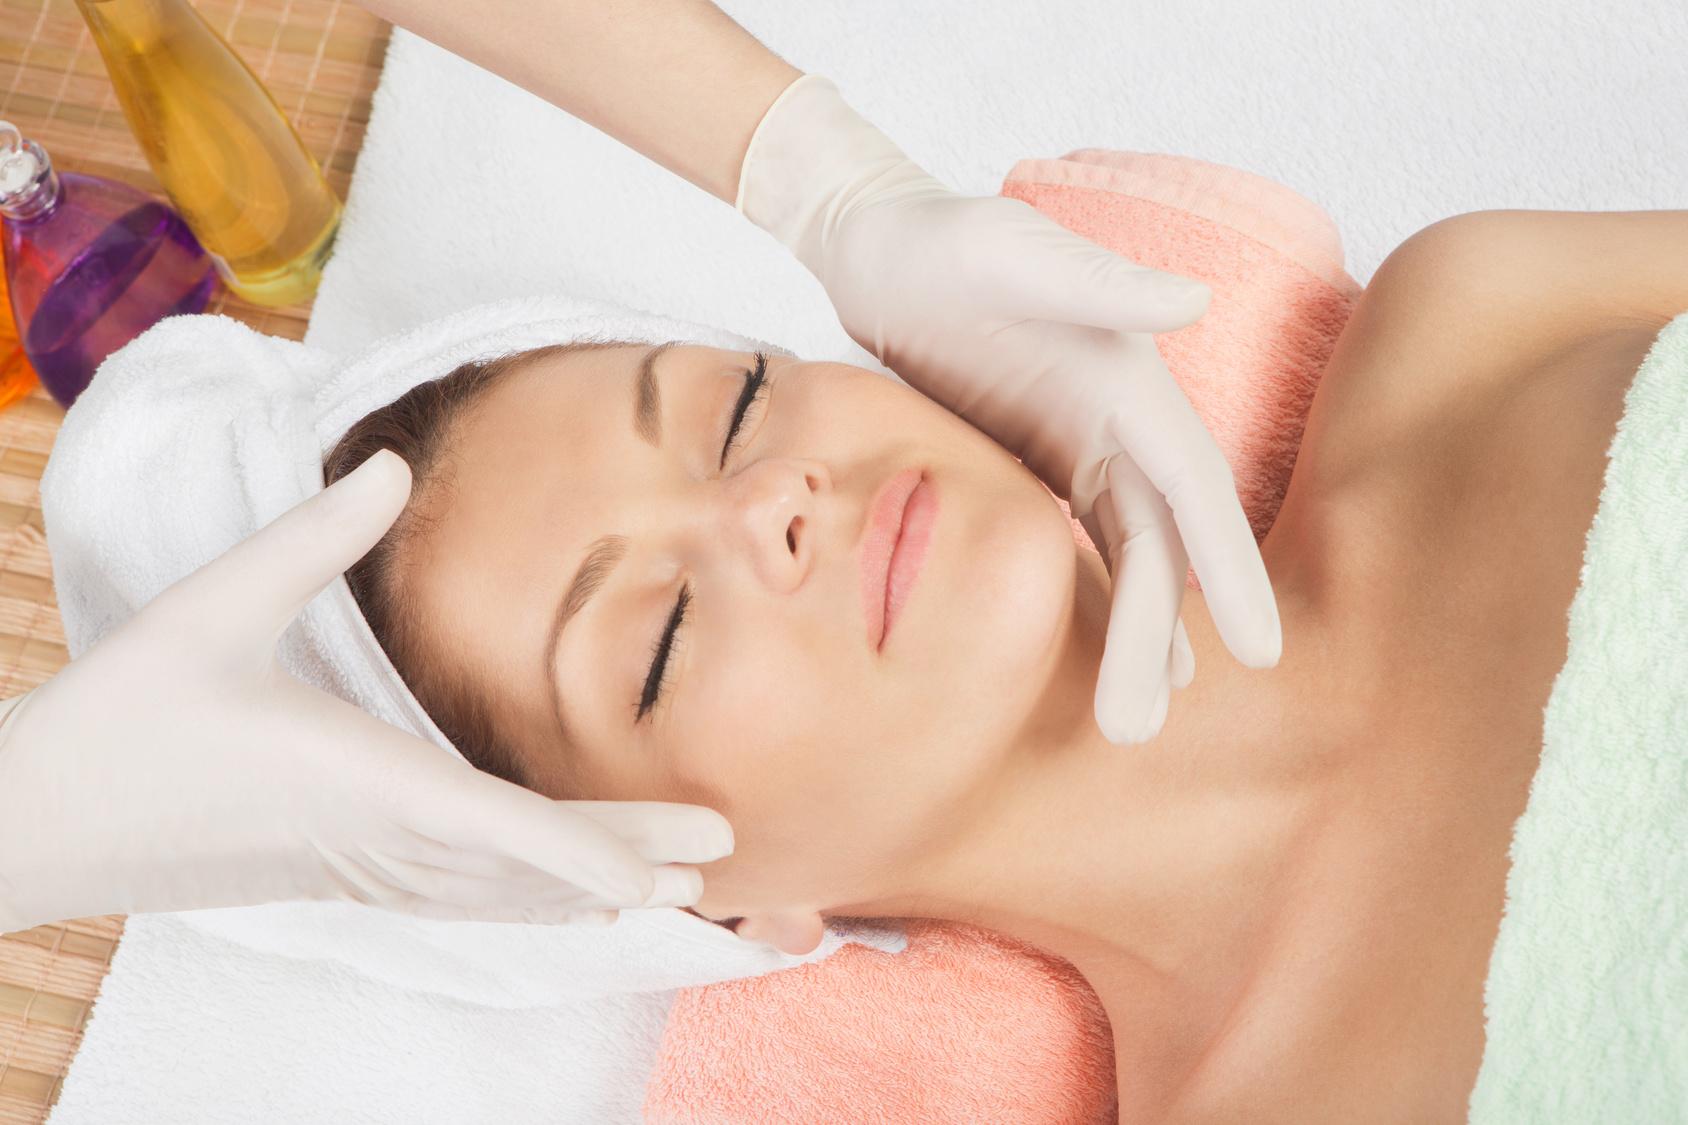 Anti-aging mesoterapia vain 39€ (arvo 130€)